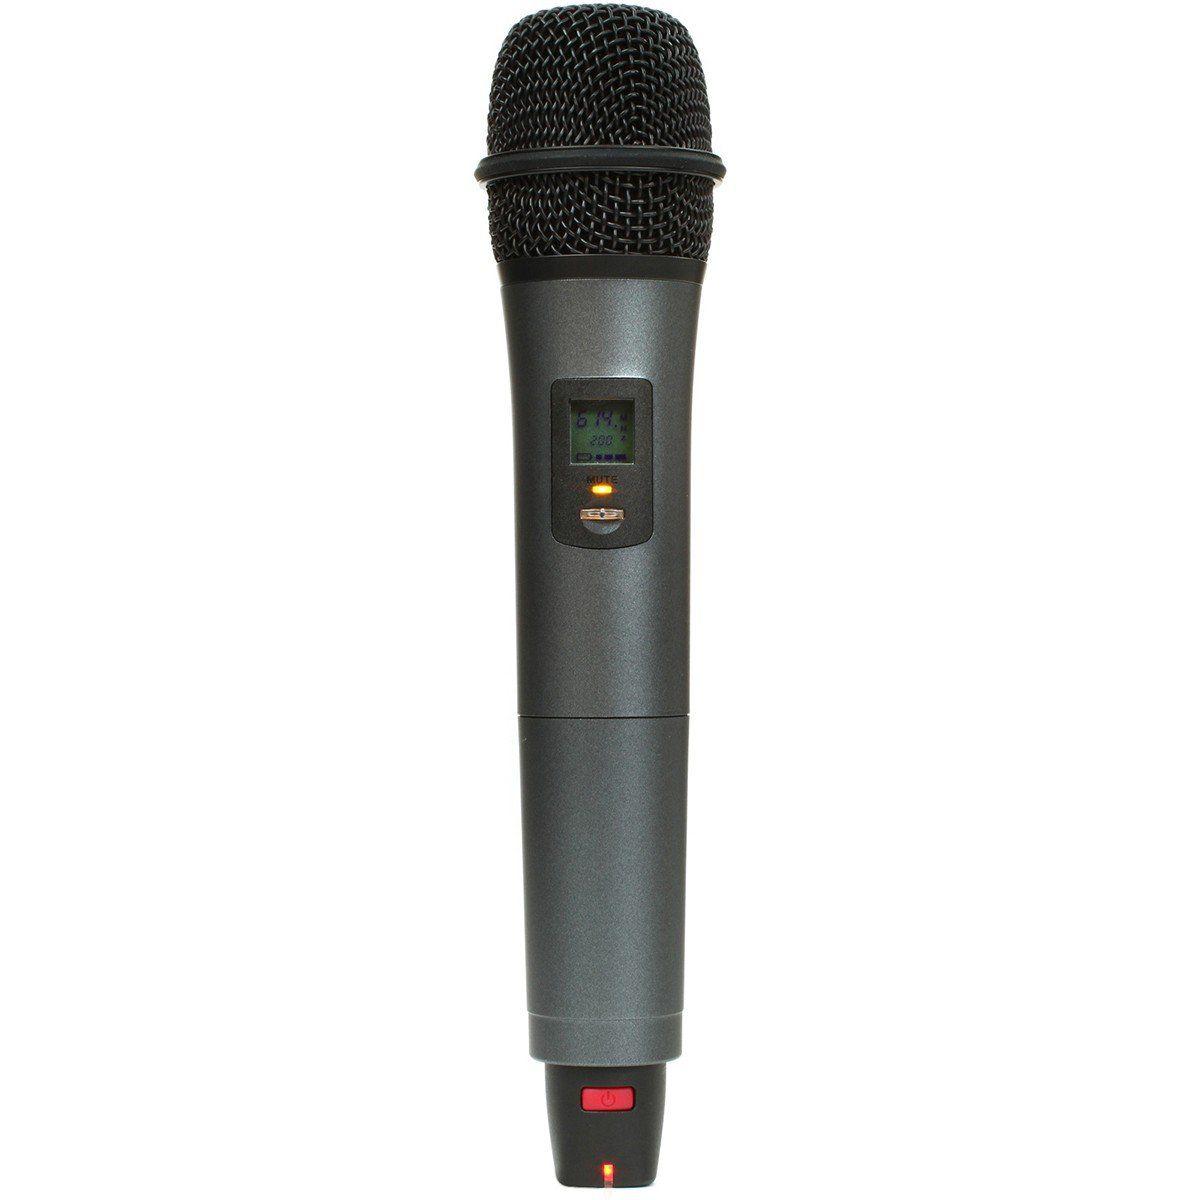 Sennheiser XSW35 Microfone Dinâmico Cardioide Sennheiser-XSW35 para Eventos